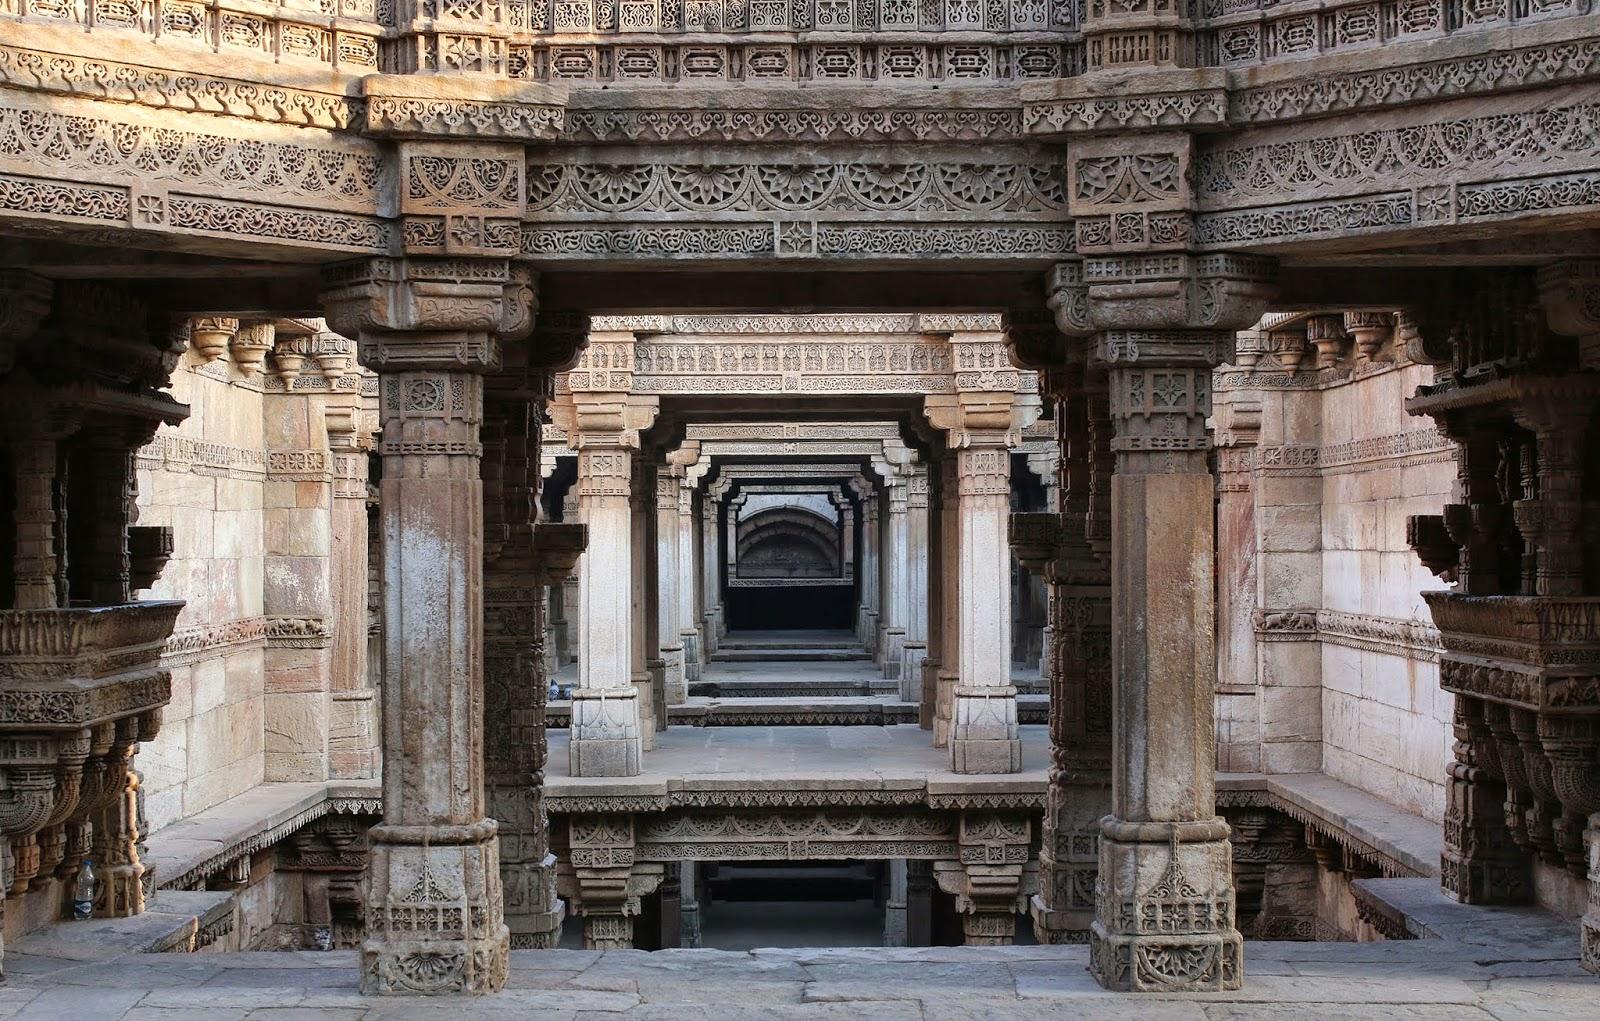 adalaj-stepwell-a-unique-hindu-water-buil-secret-world